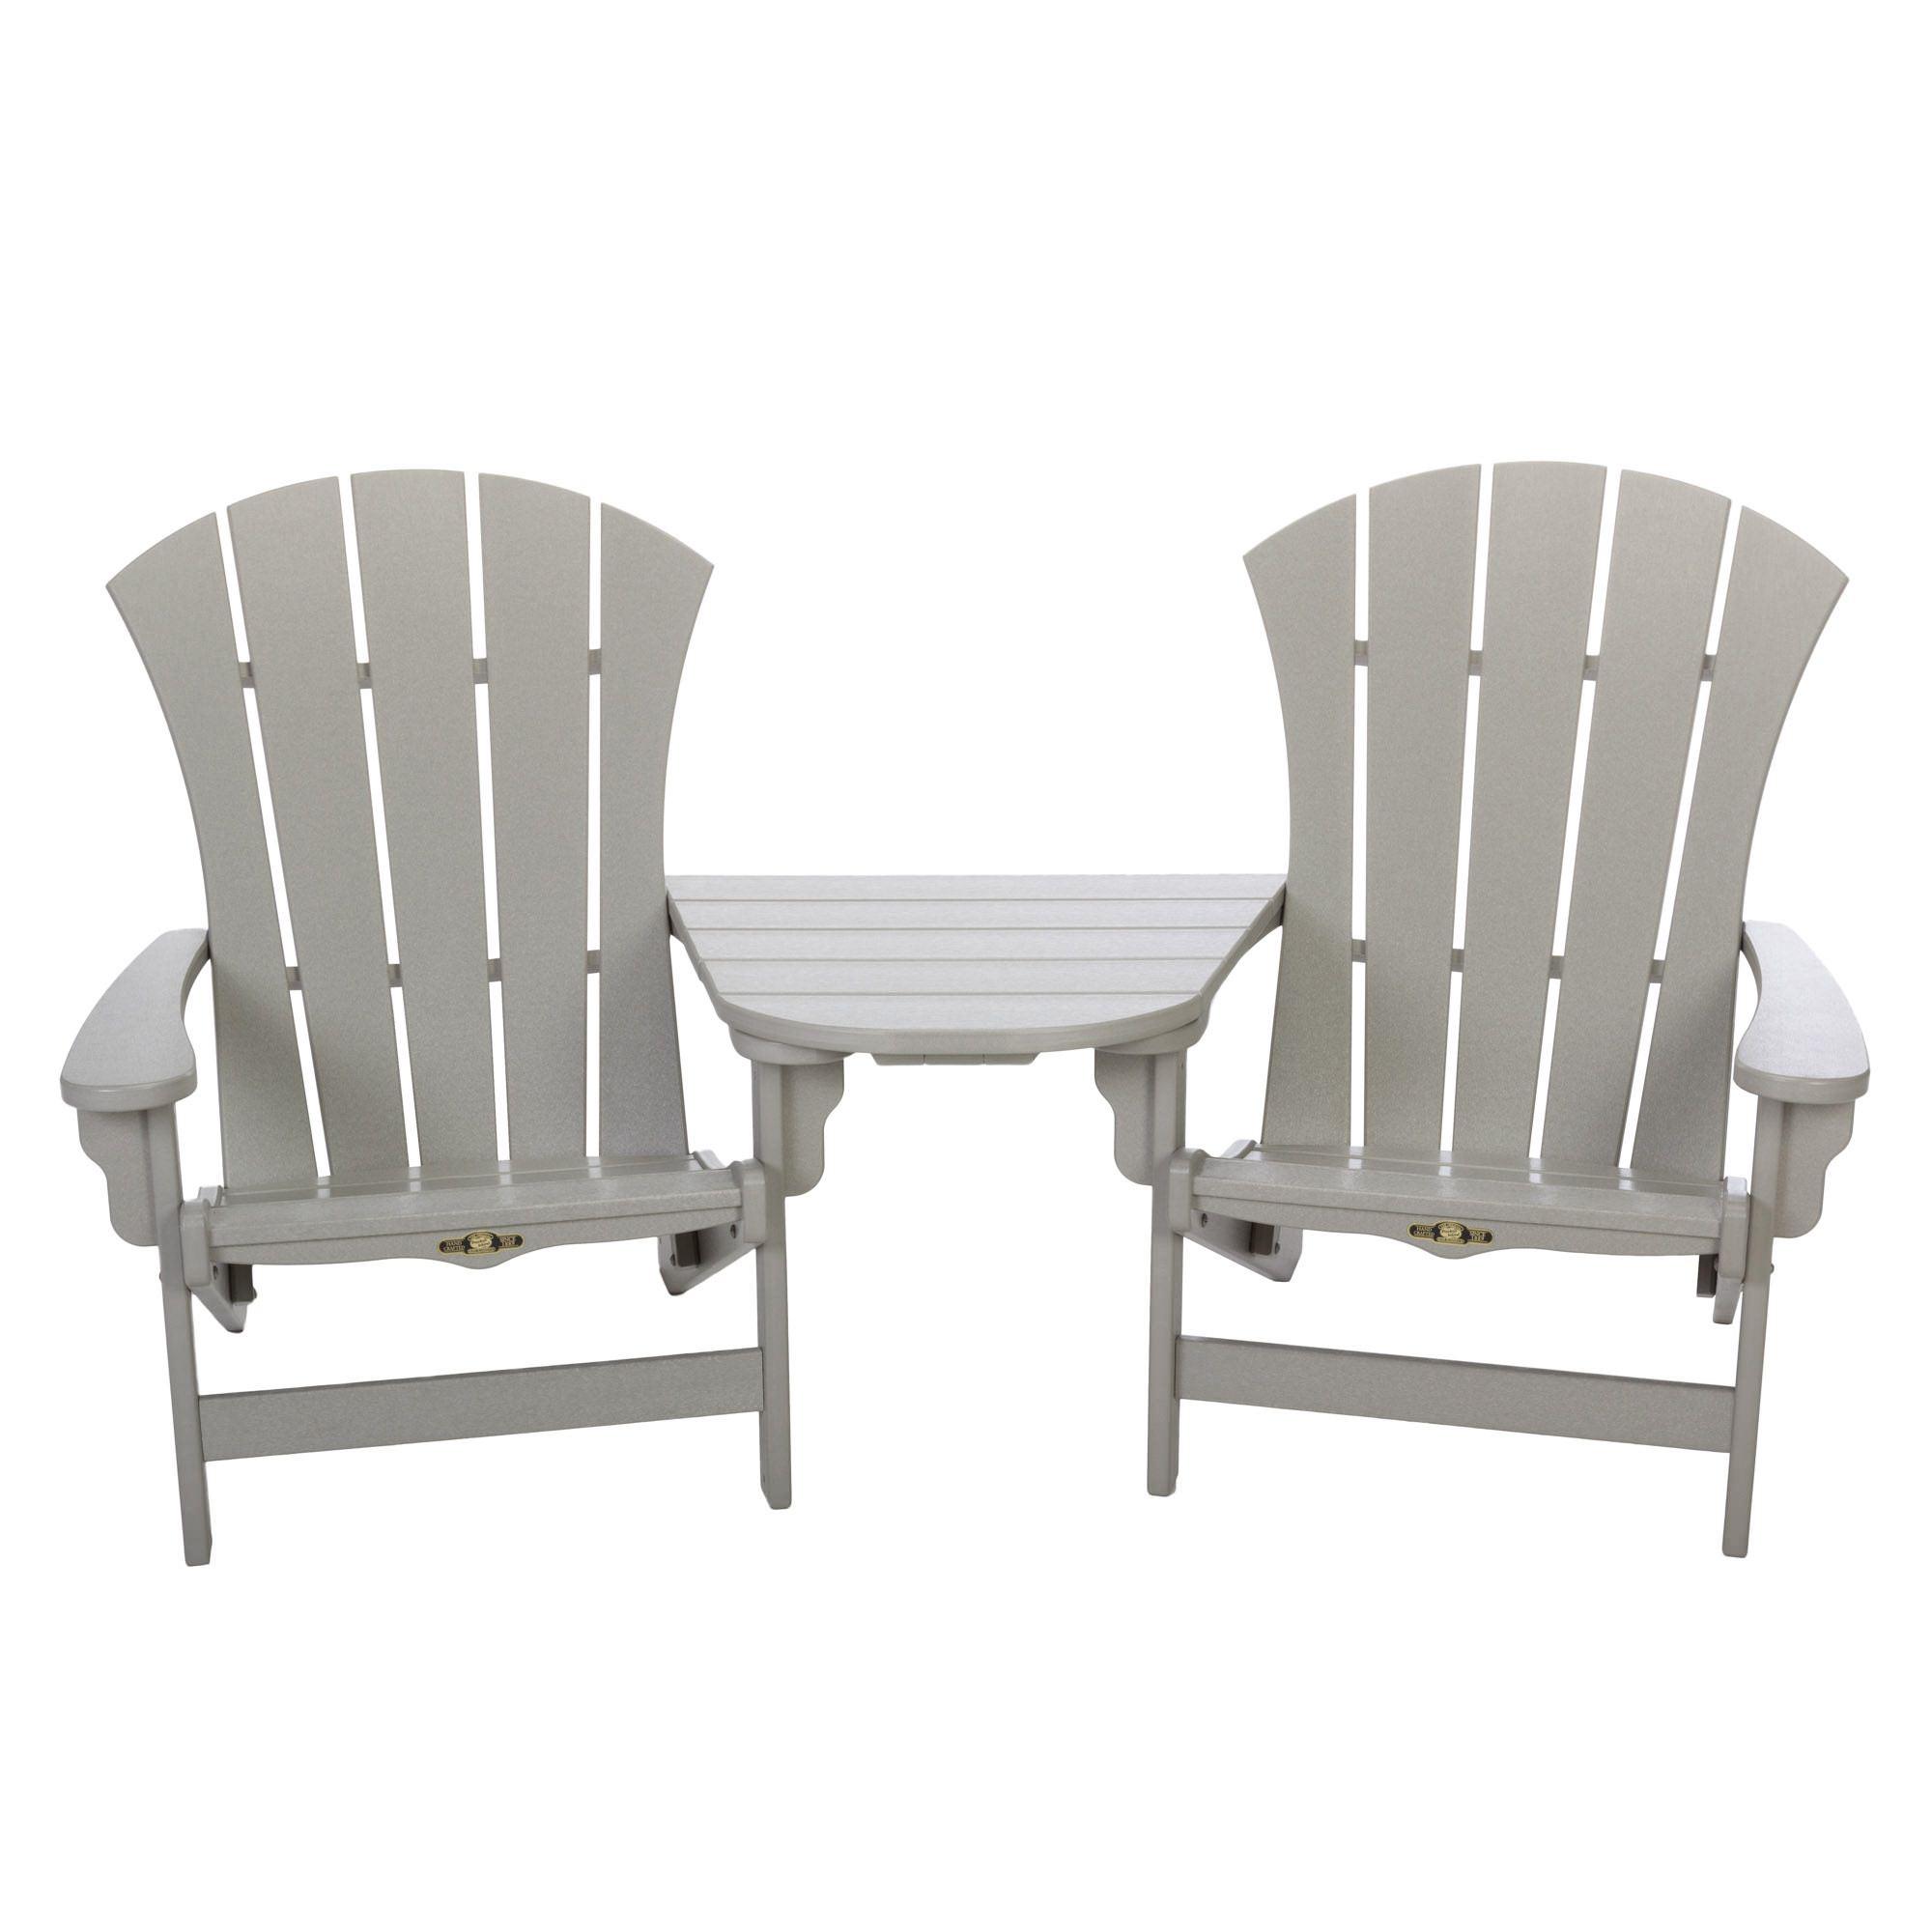 3 Piece Sunrise Adirondack Chair And Tete A Set